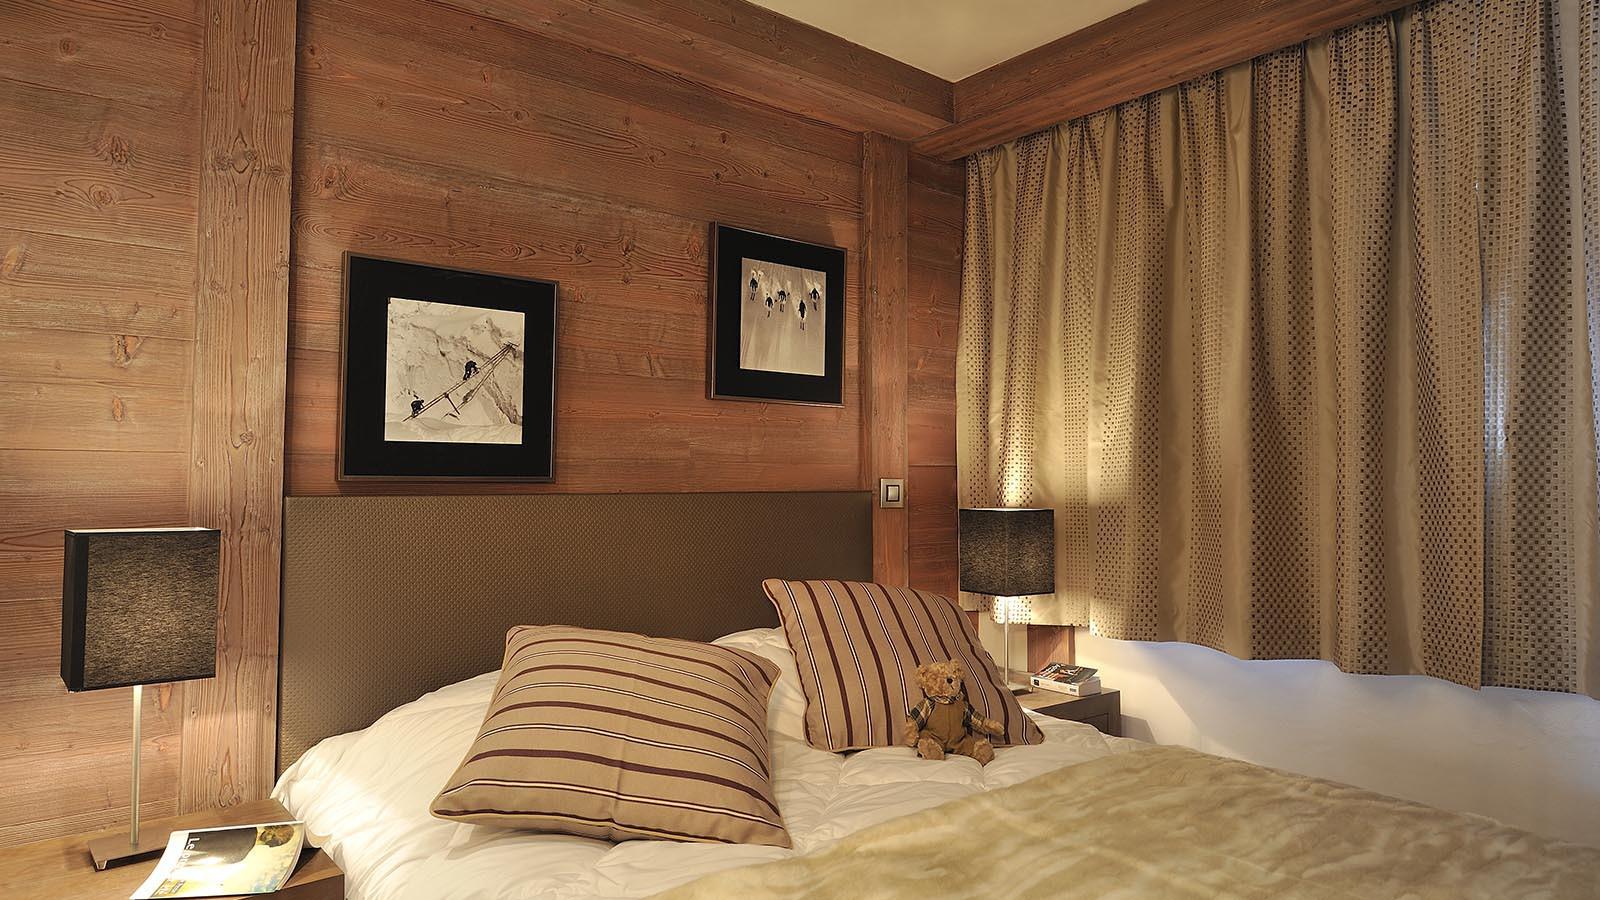 Bedroom at CGH Le Centaure-apartment